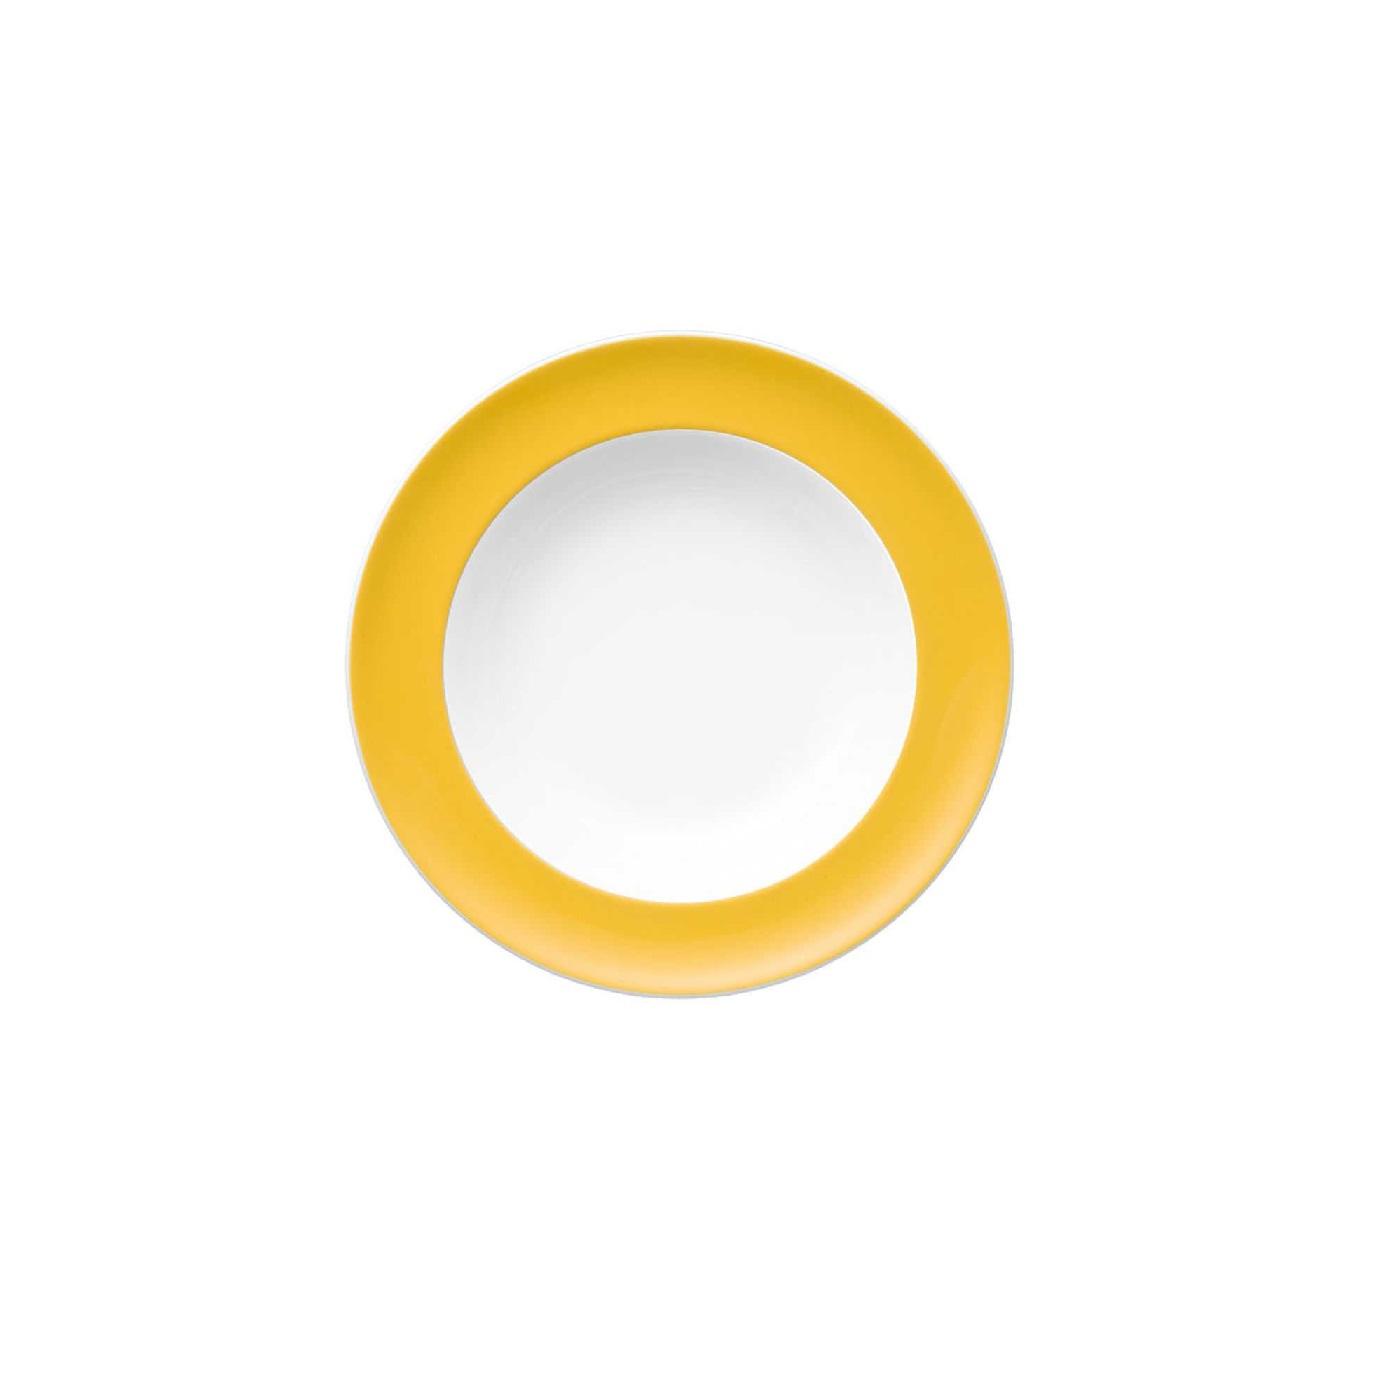 Тарелка глубокая Rosenthal SUNNY DAY, диаметр 23 см, желтый Rosenthal 70850-408502-10323 фото 2